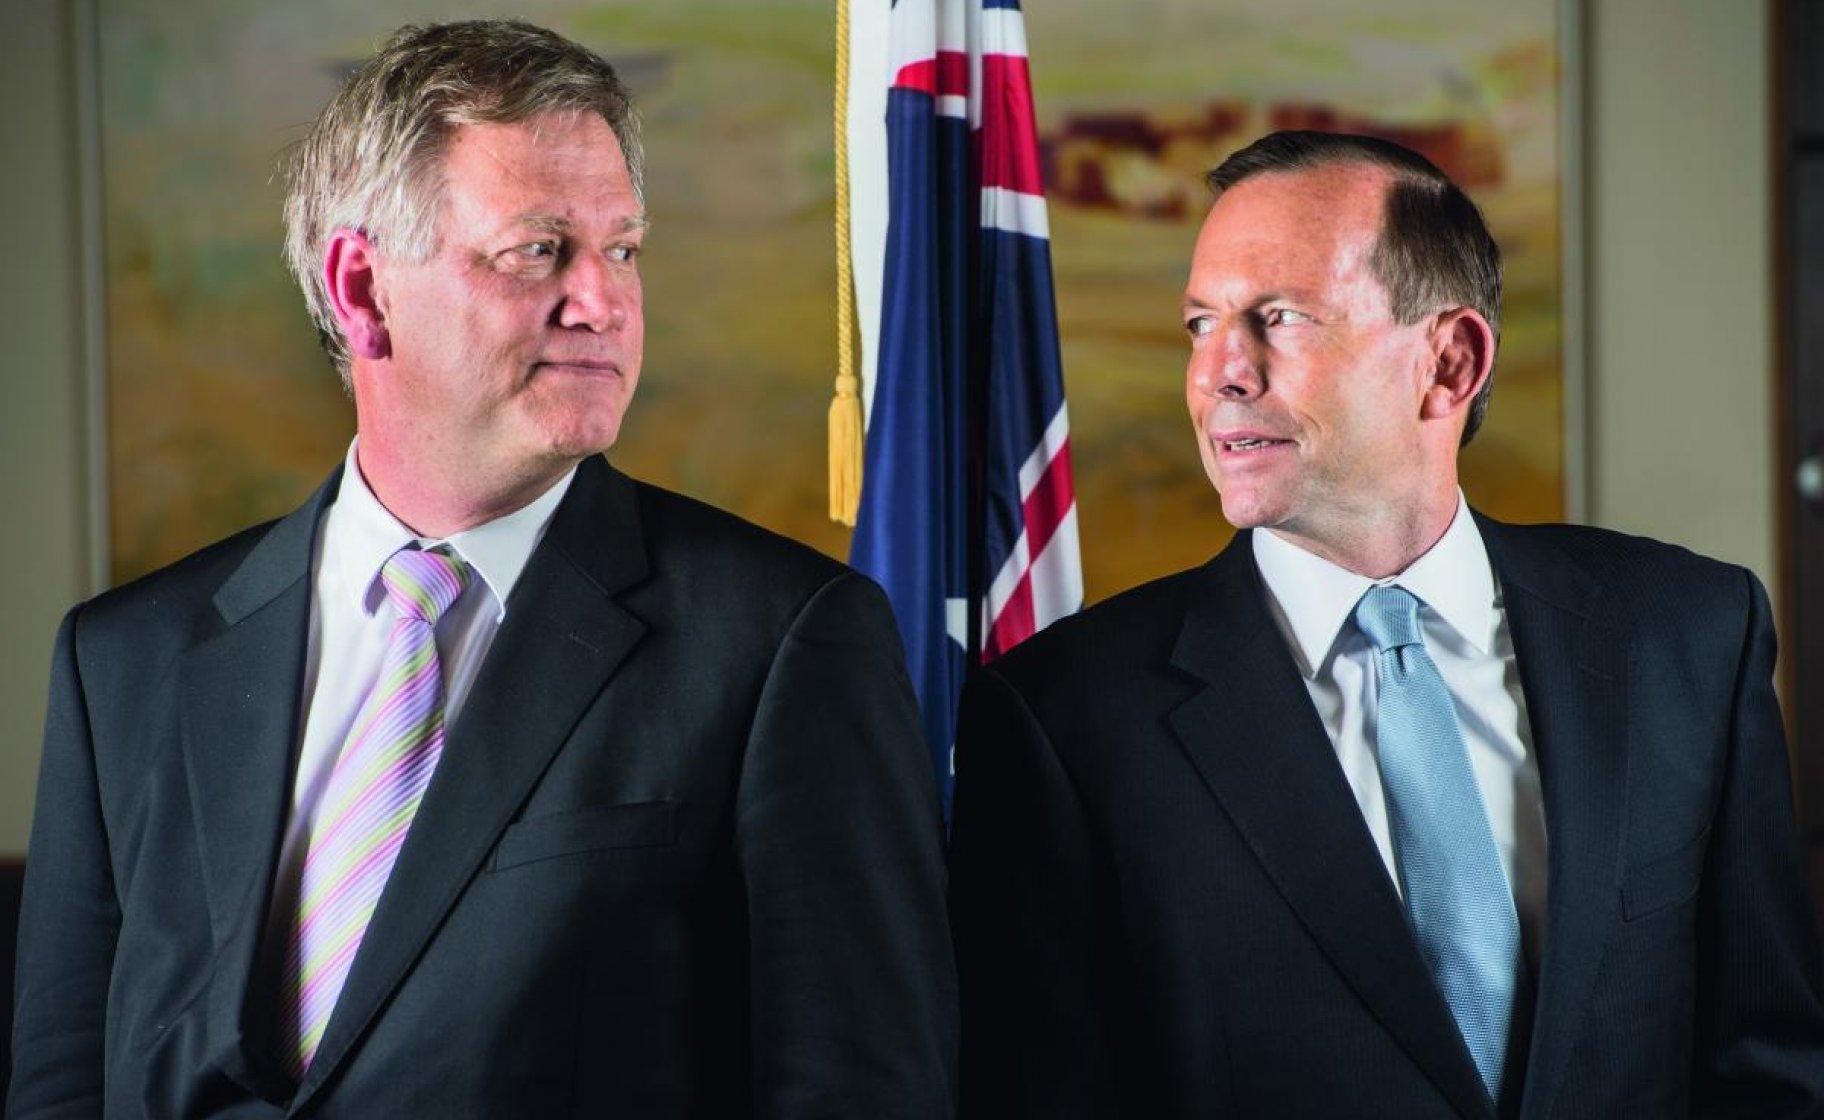 Andrew Bolt and Tony Abbott. © Jason Edwards / Newspix